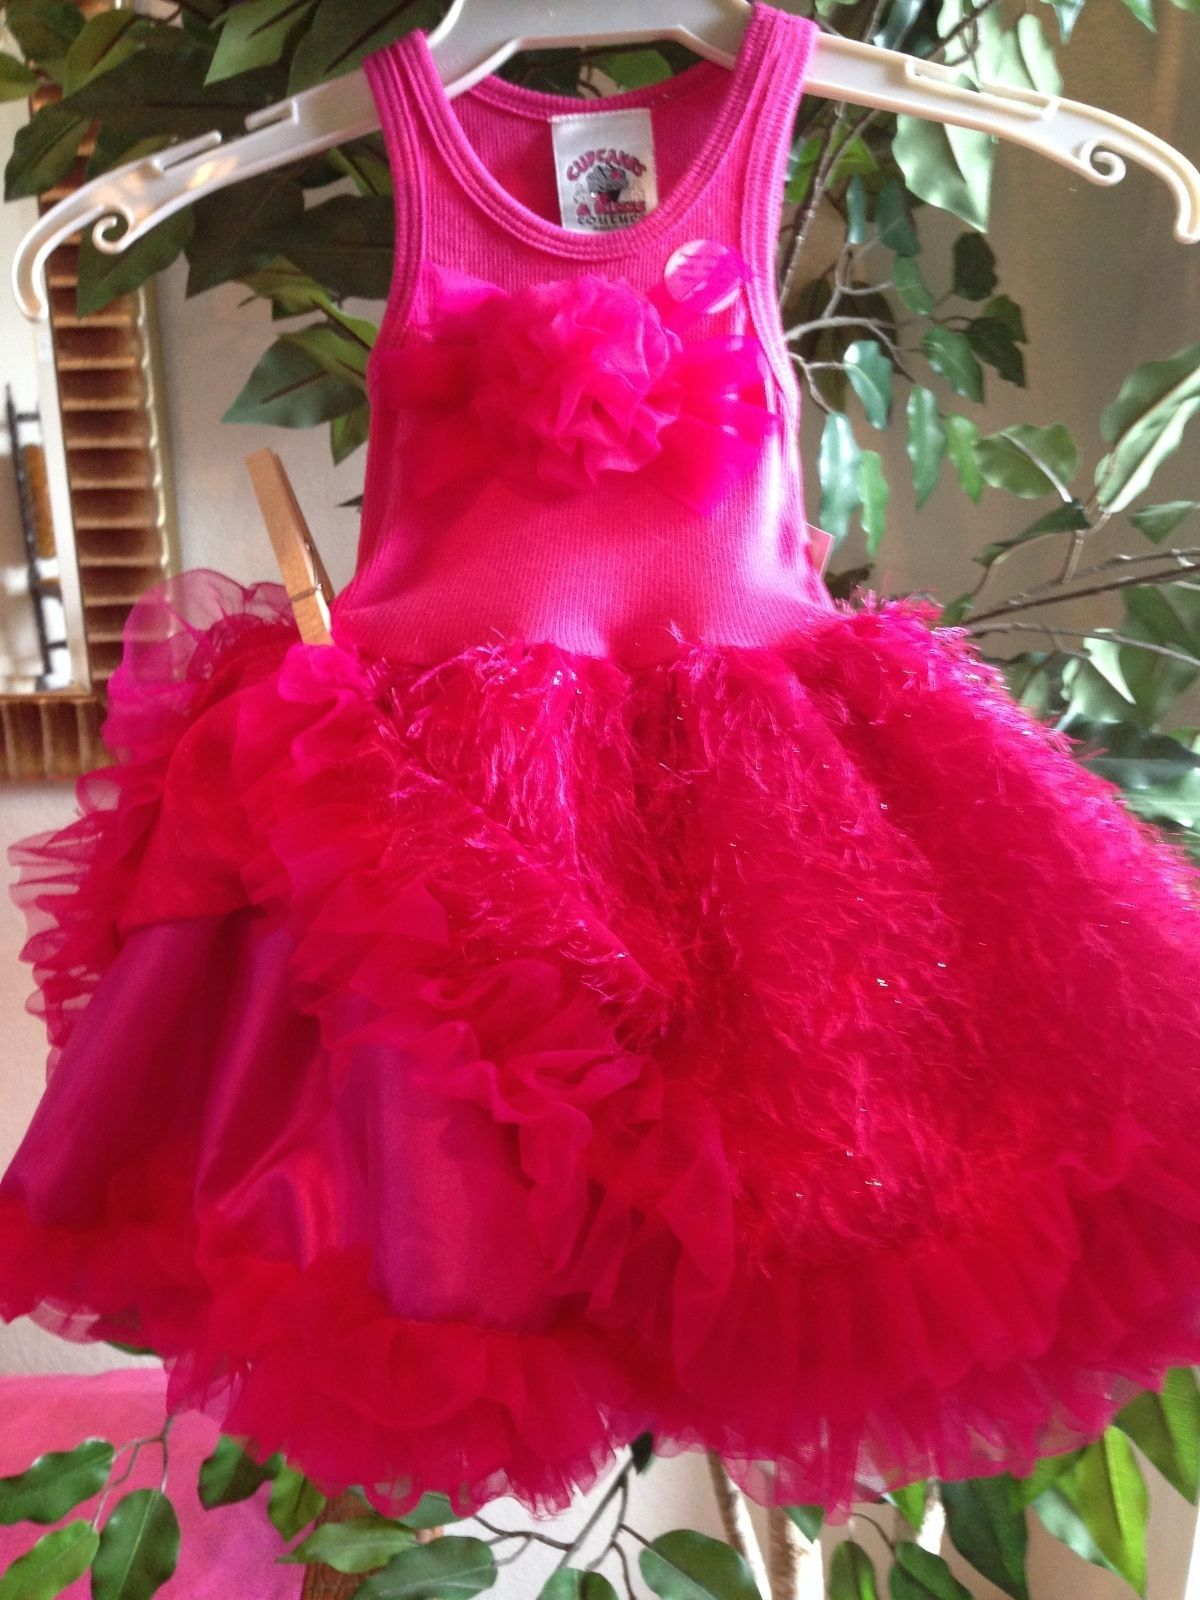 Image 4 of Posh Sparkly Fuchsia Eyelash Chiffon Pink Tutu Dress, 6M-5/6 USA Cupcakes Kisses